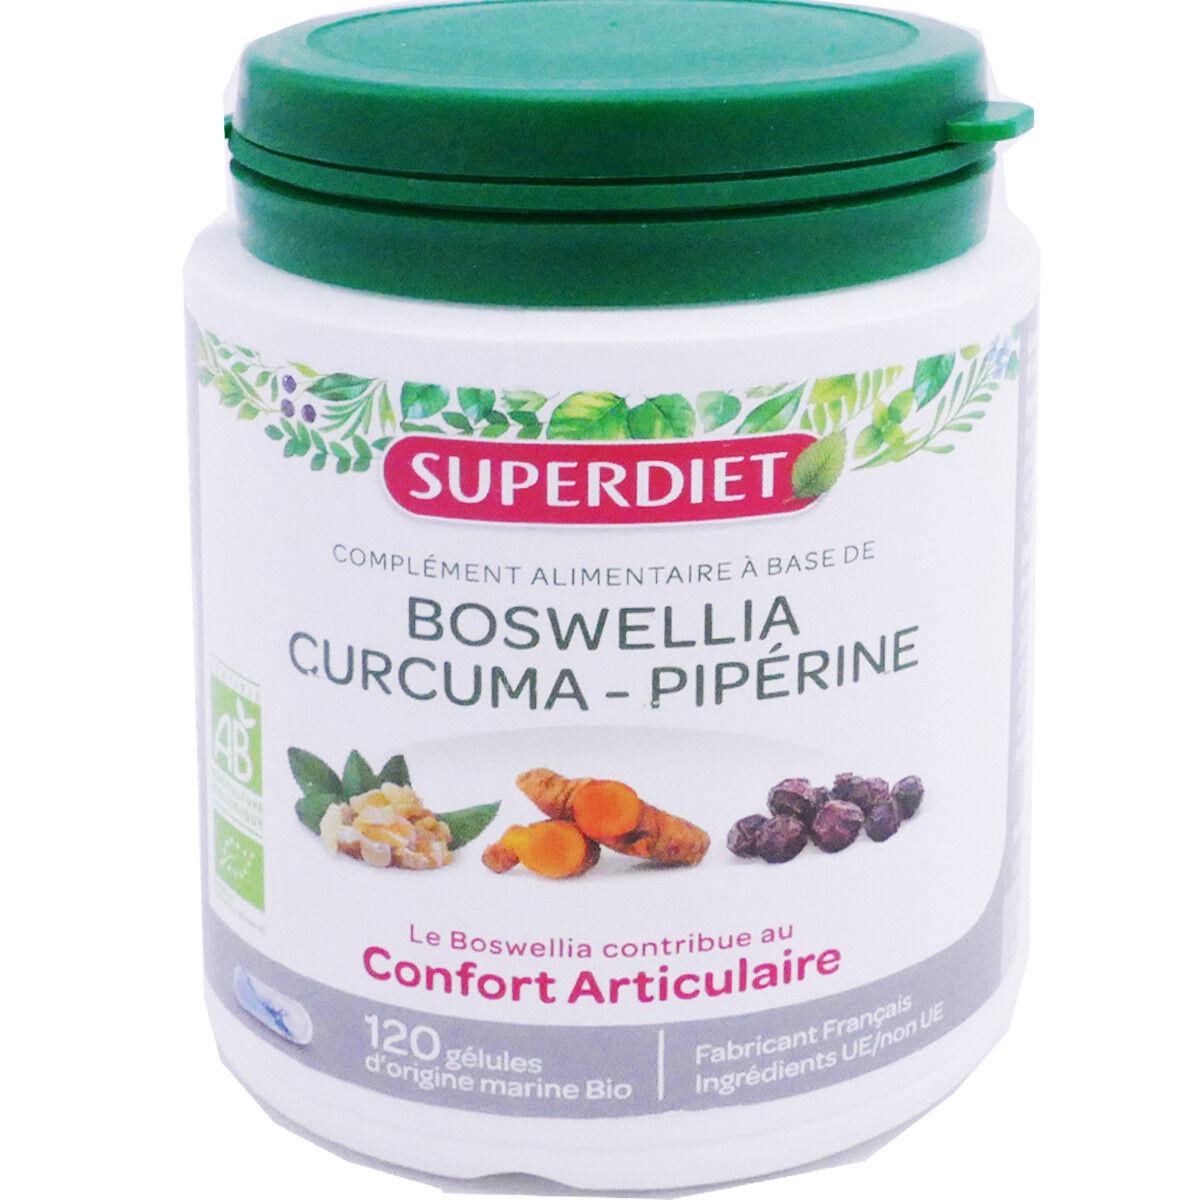 SUPER DIET Superdiet boswellia curcuma piperine articulation 120 gelules